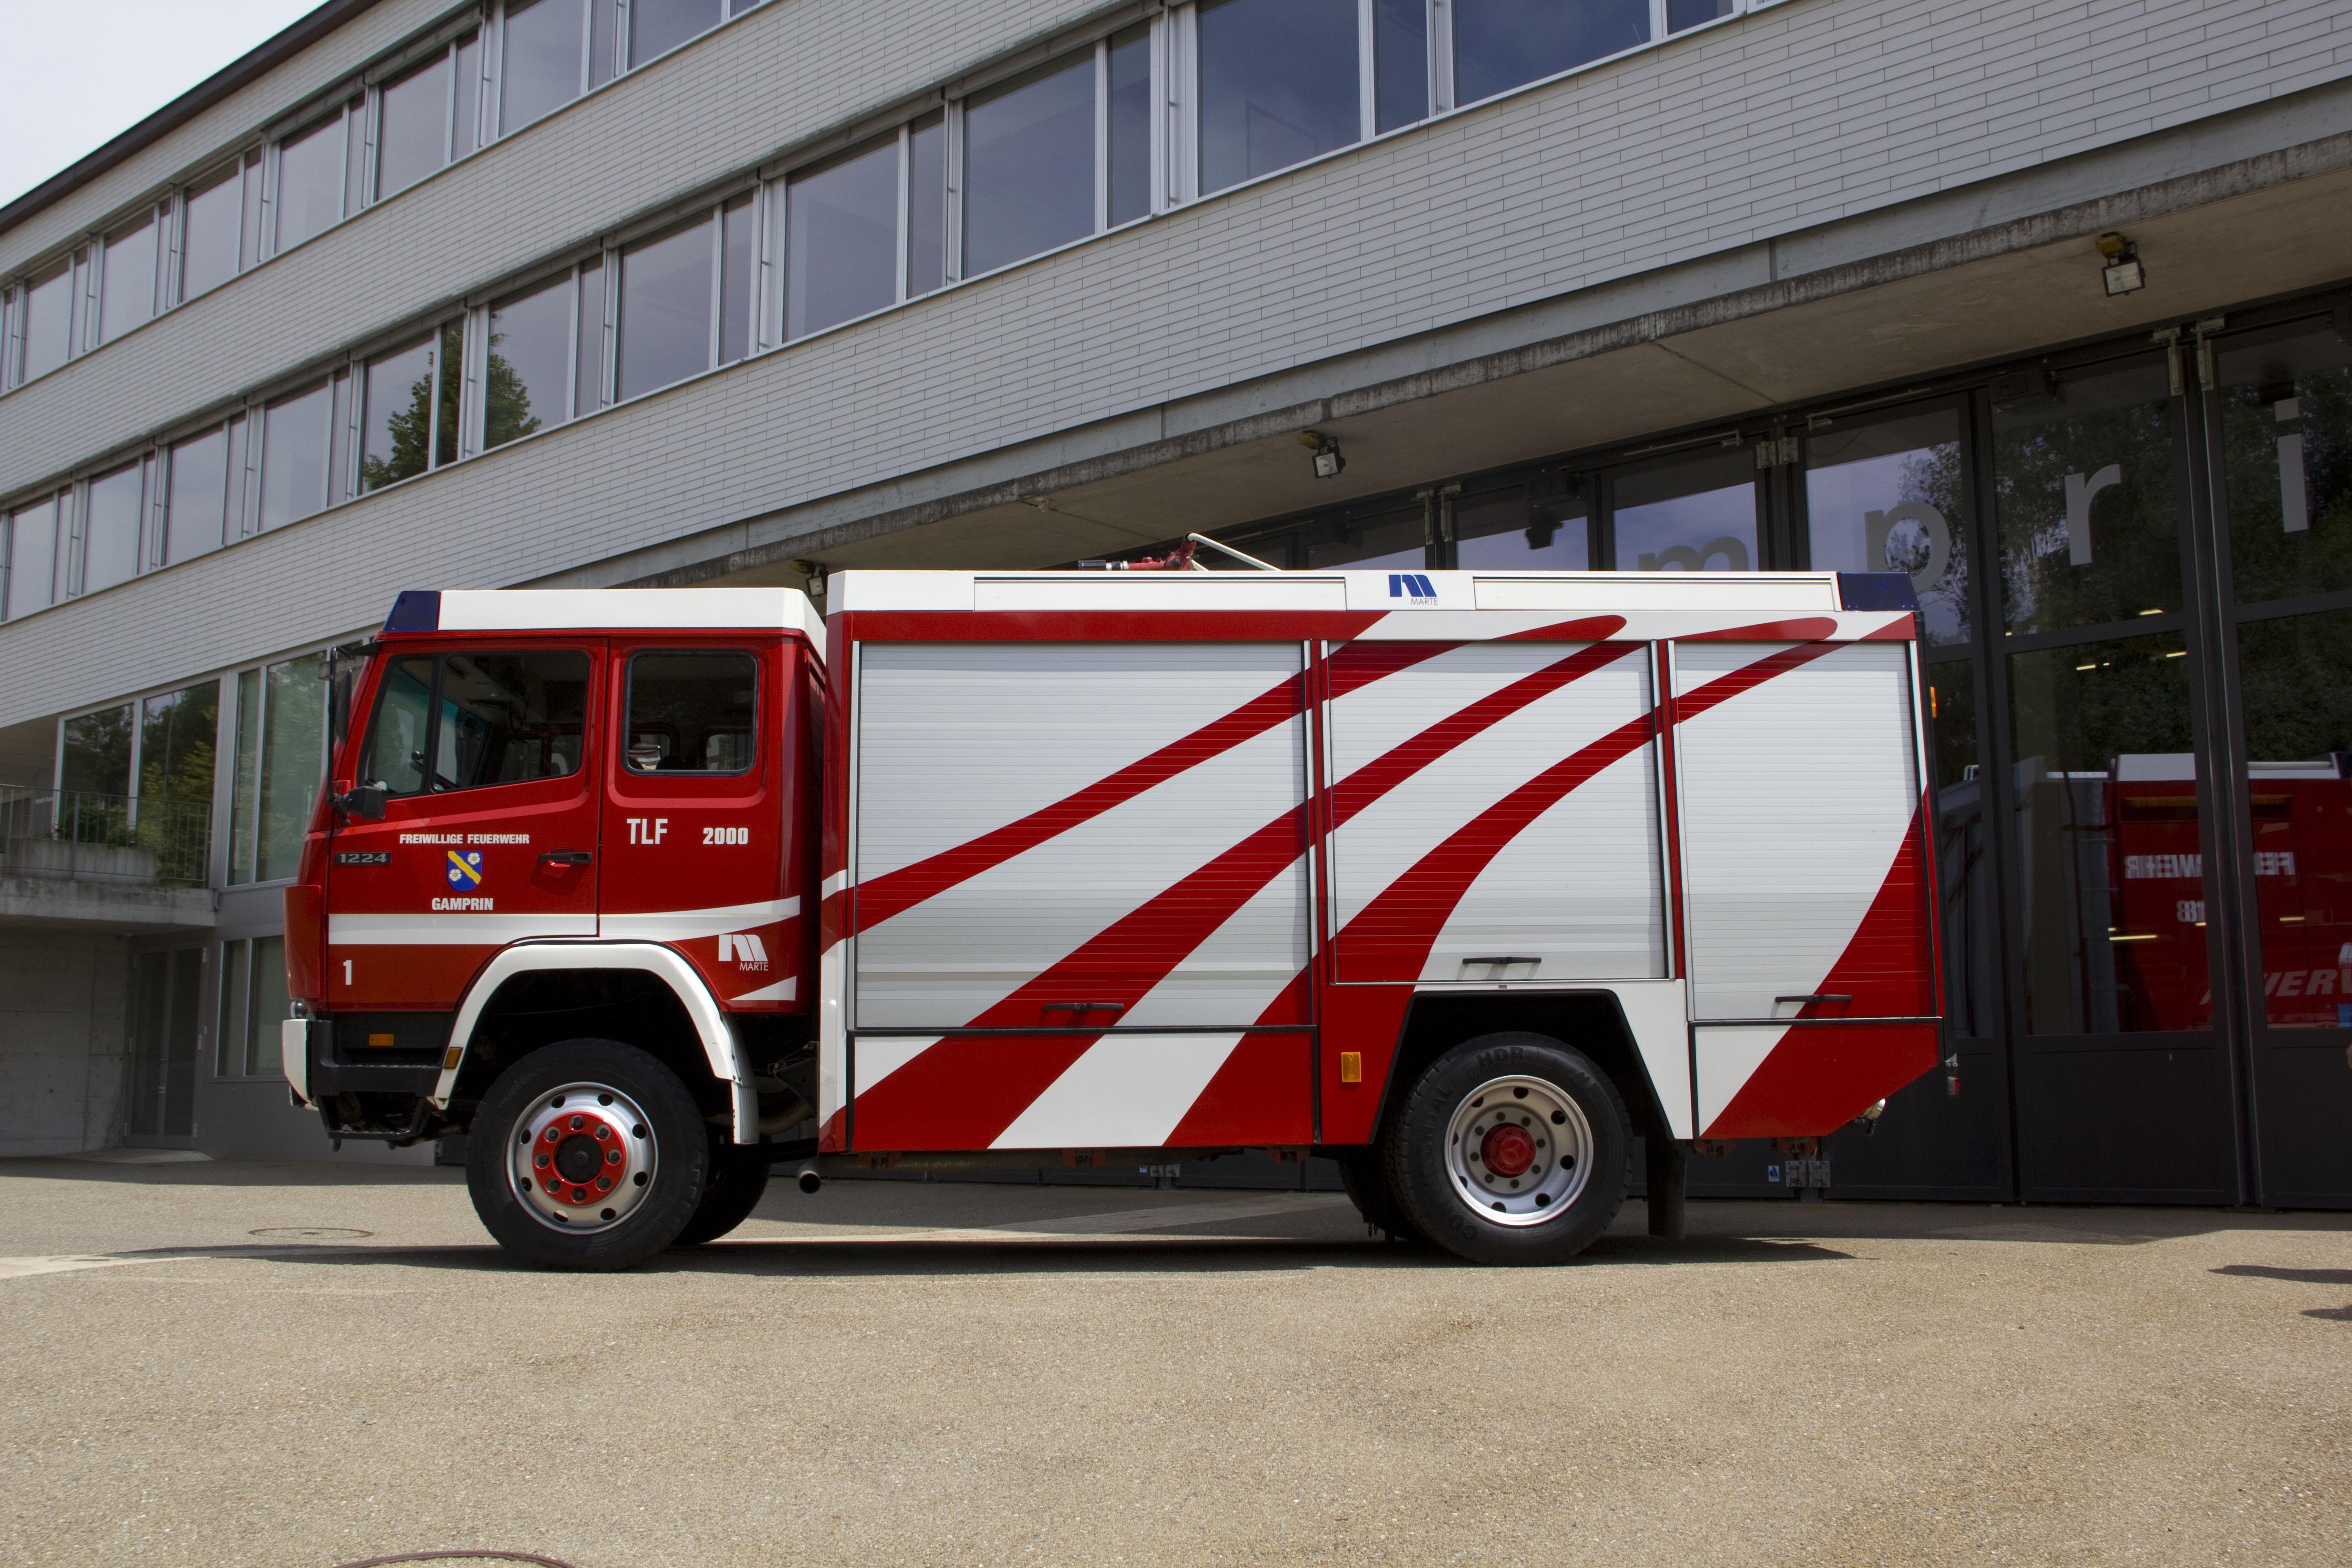 Tanklöschfahrzeug